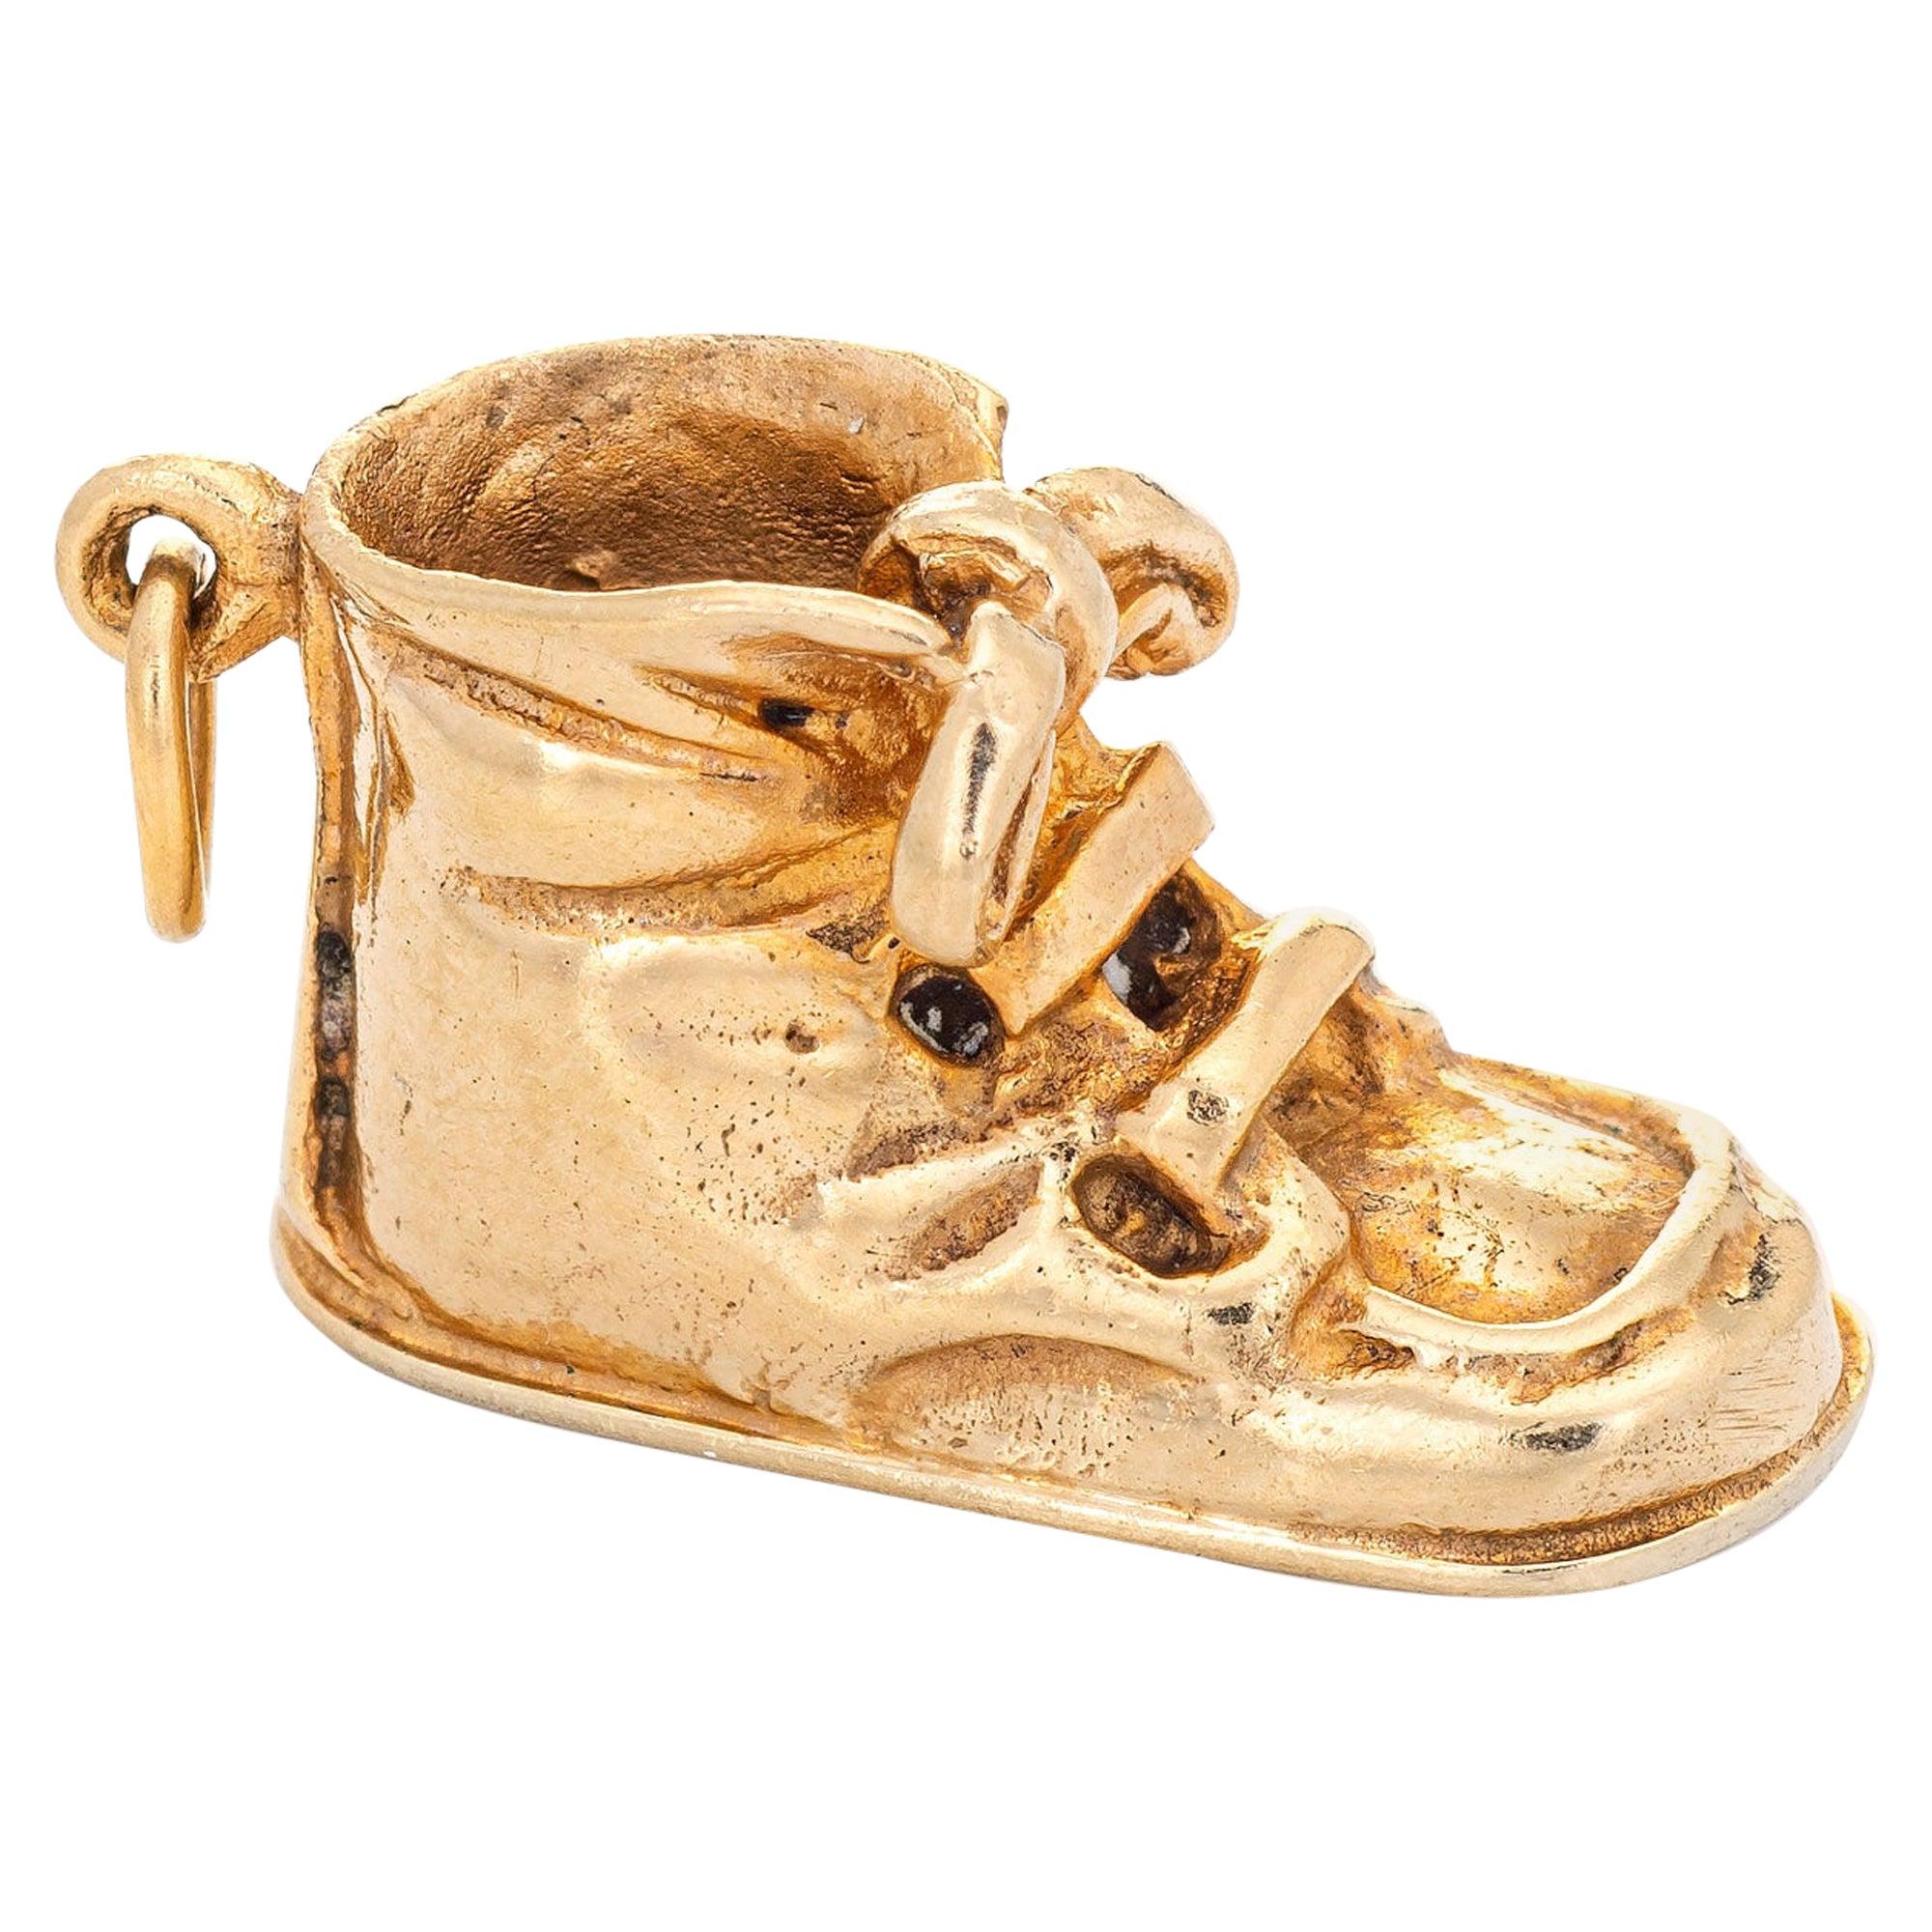 Baby Shoe Charm Vintage 14 Karat Yellow Gold Boot Estate Pendant Fine Jewelry